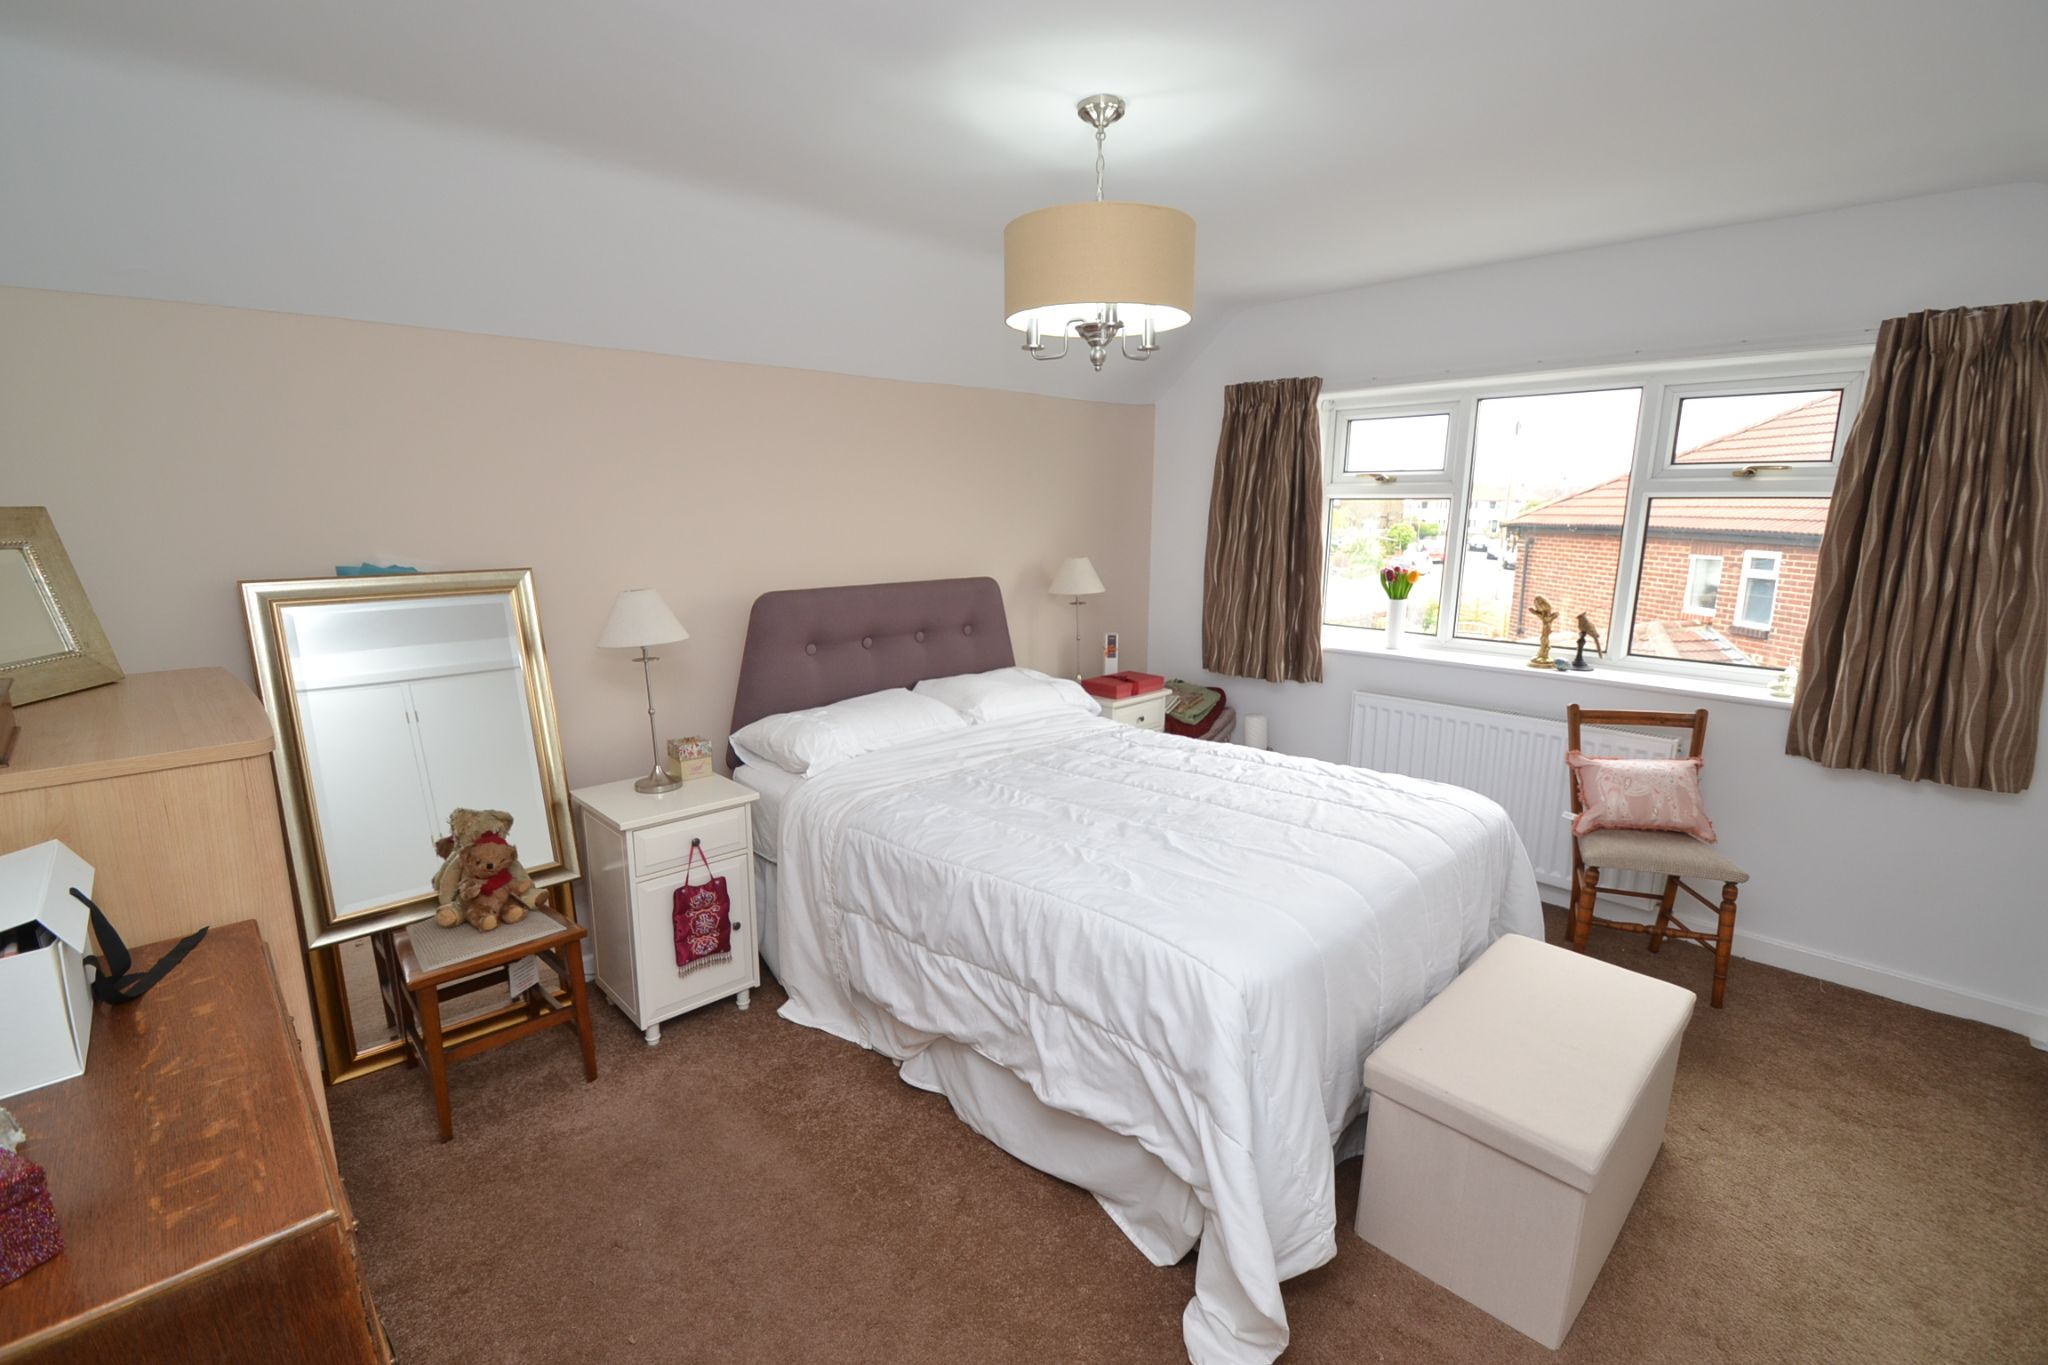 2 Bedroom Semi-detached Dormer House For Sale - Photograph 17